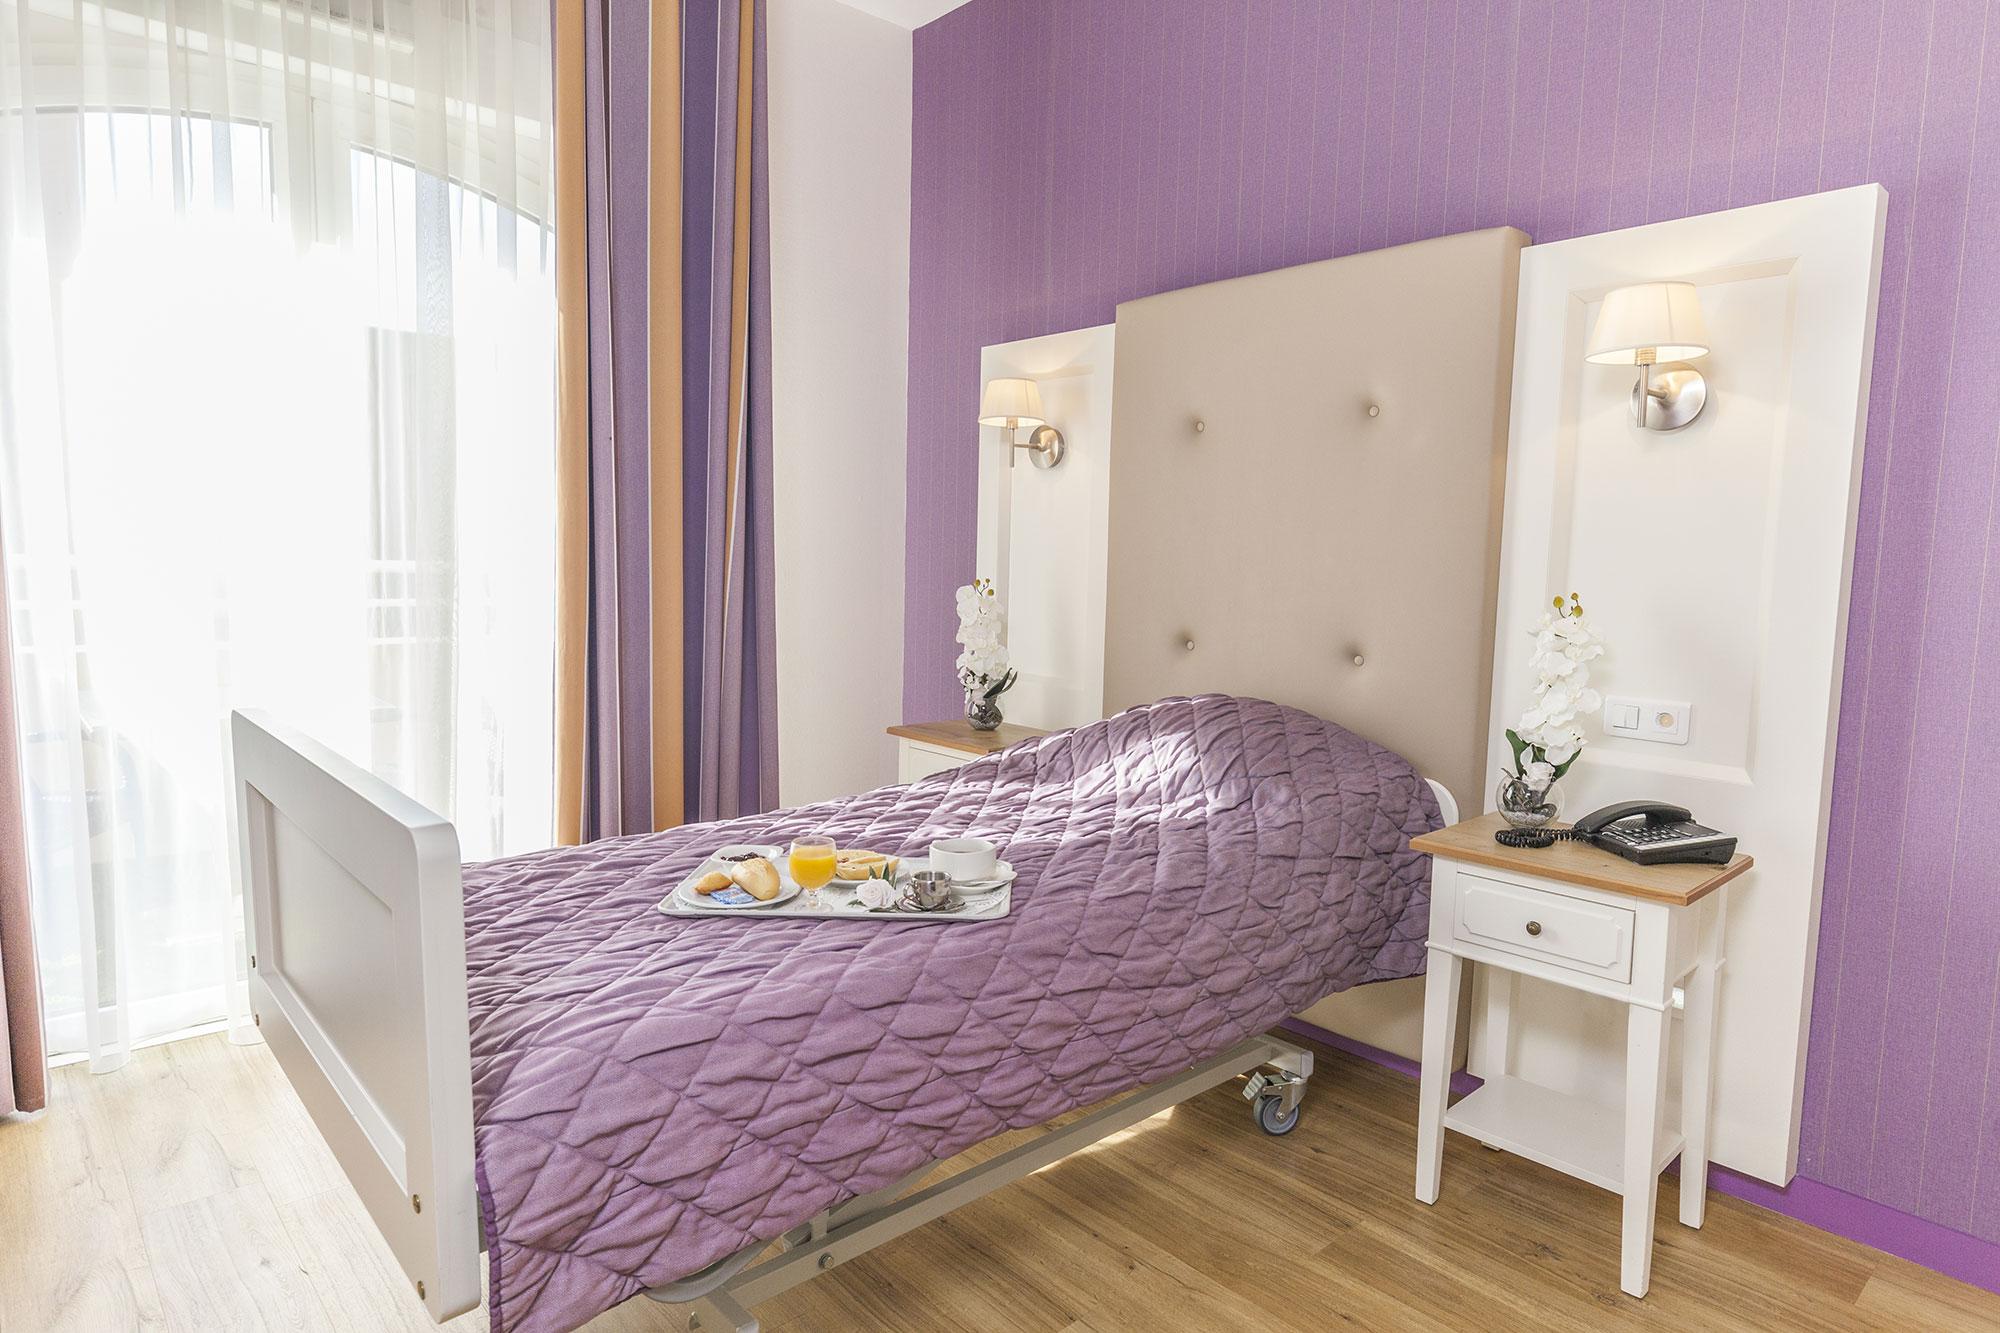 Medifar - Residence Lyna - La Colle sur Loup - Chambre